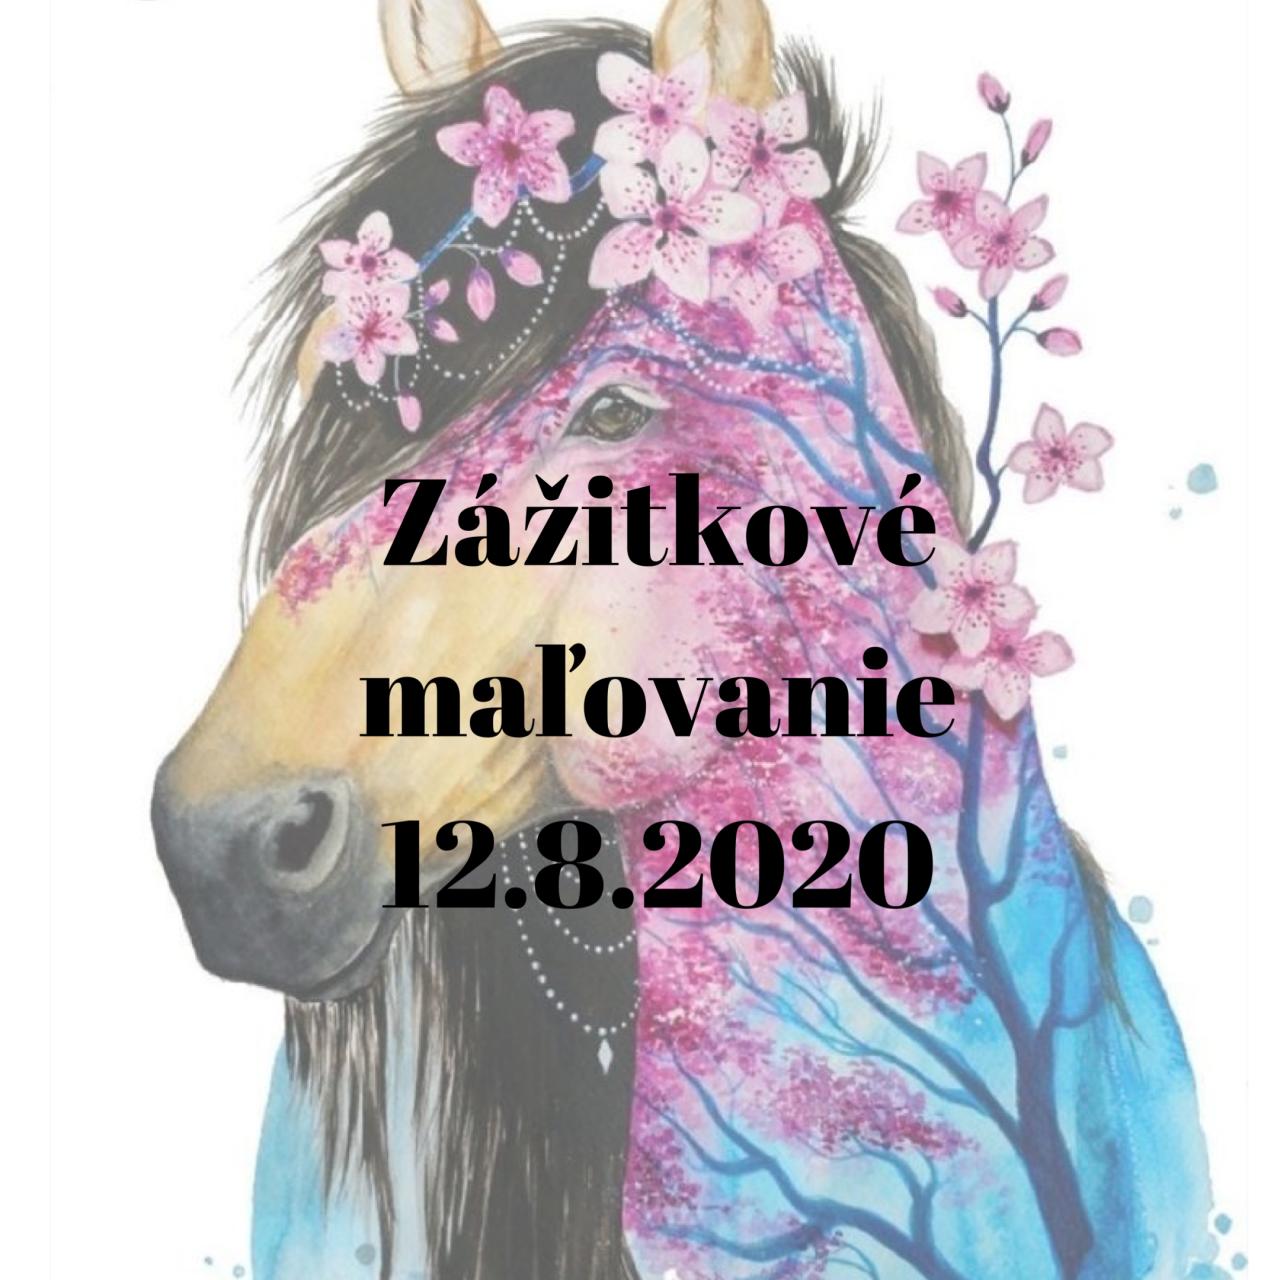 https://zazitkovemalovanie.sk/wp-content/uploads/2020/07/Dizajn-bez-názvu-1280x1280.png